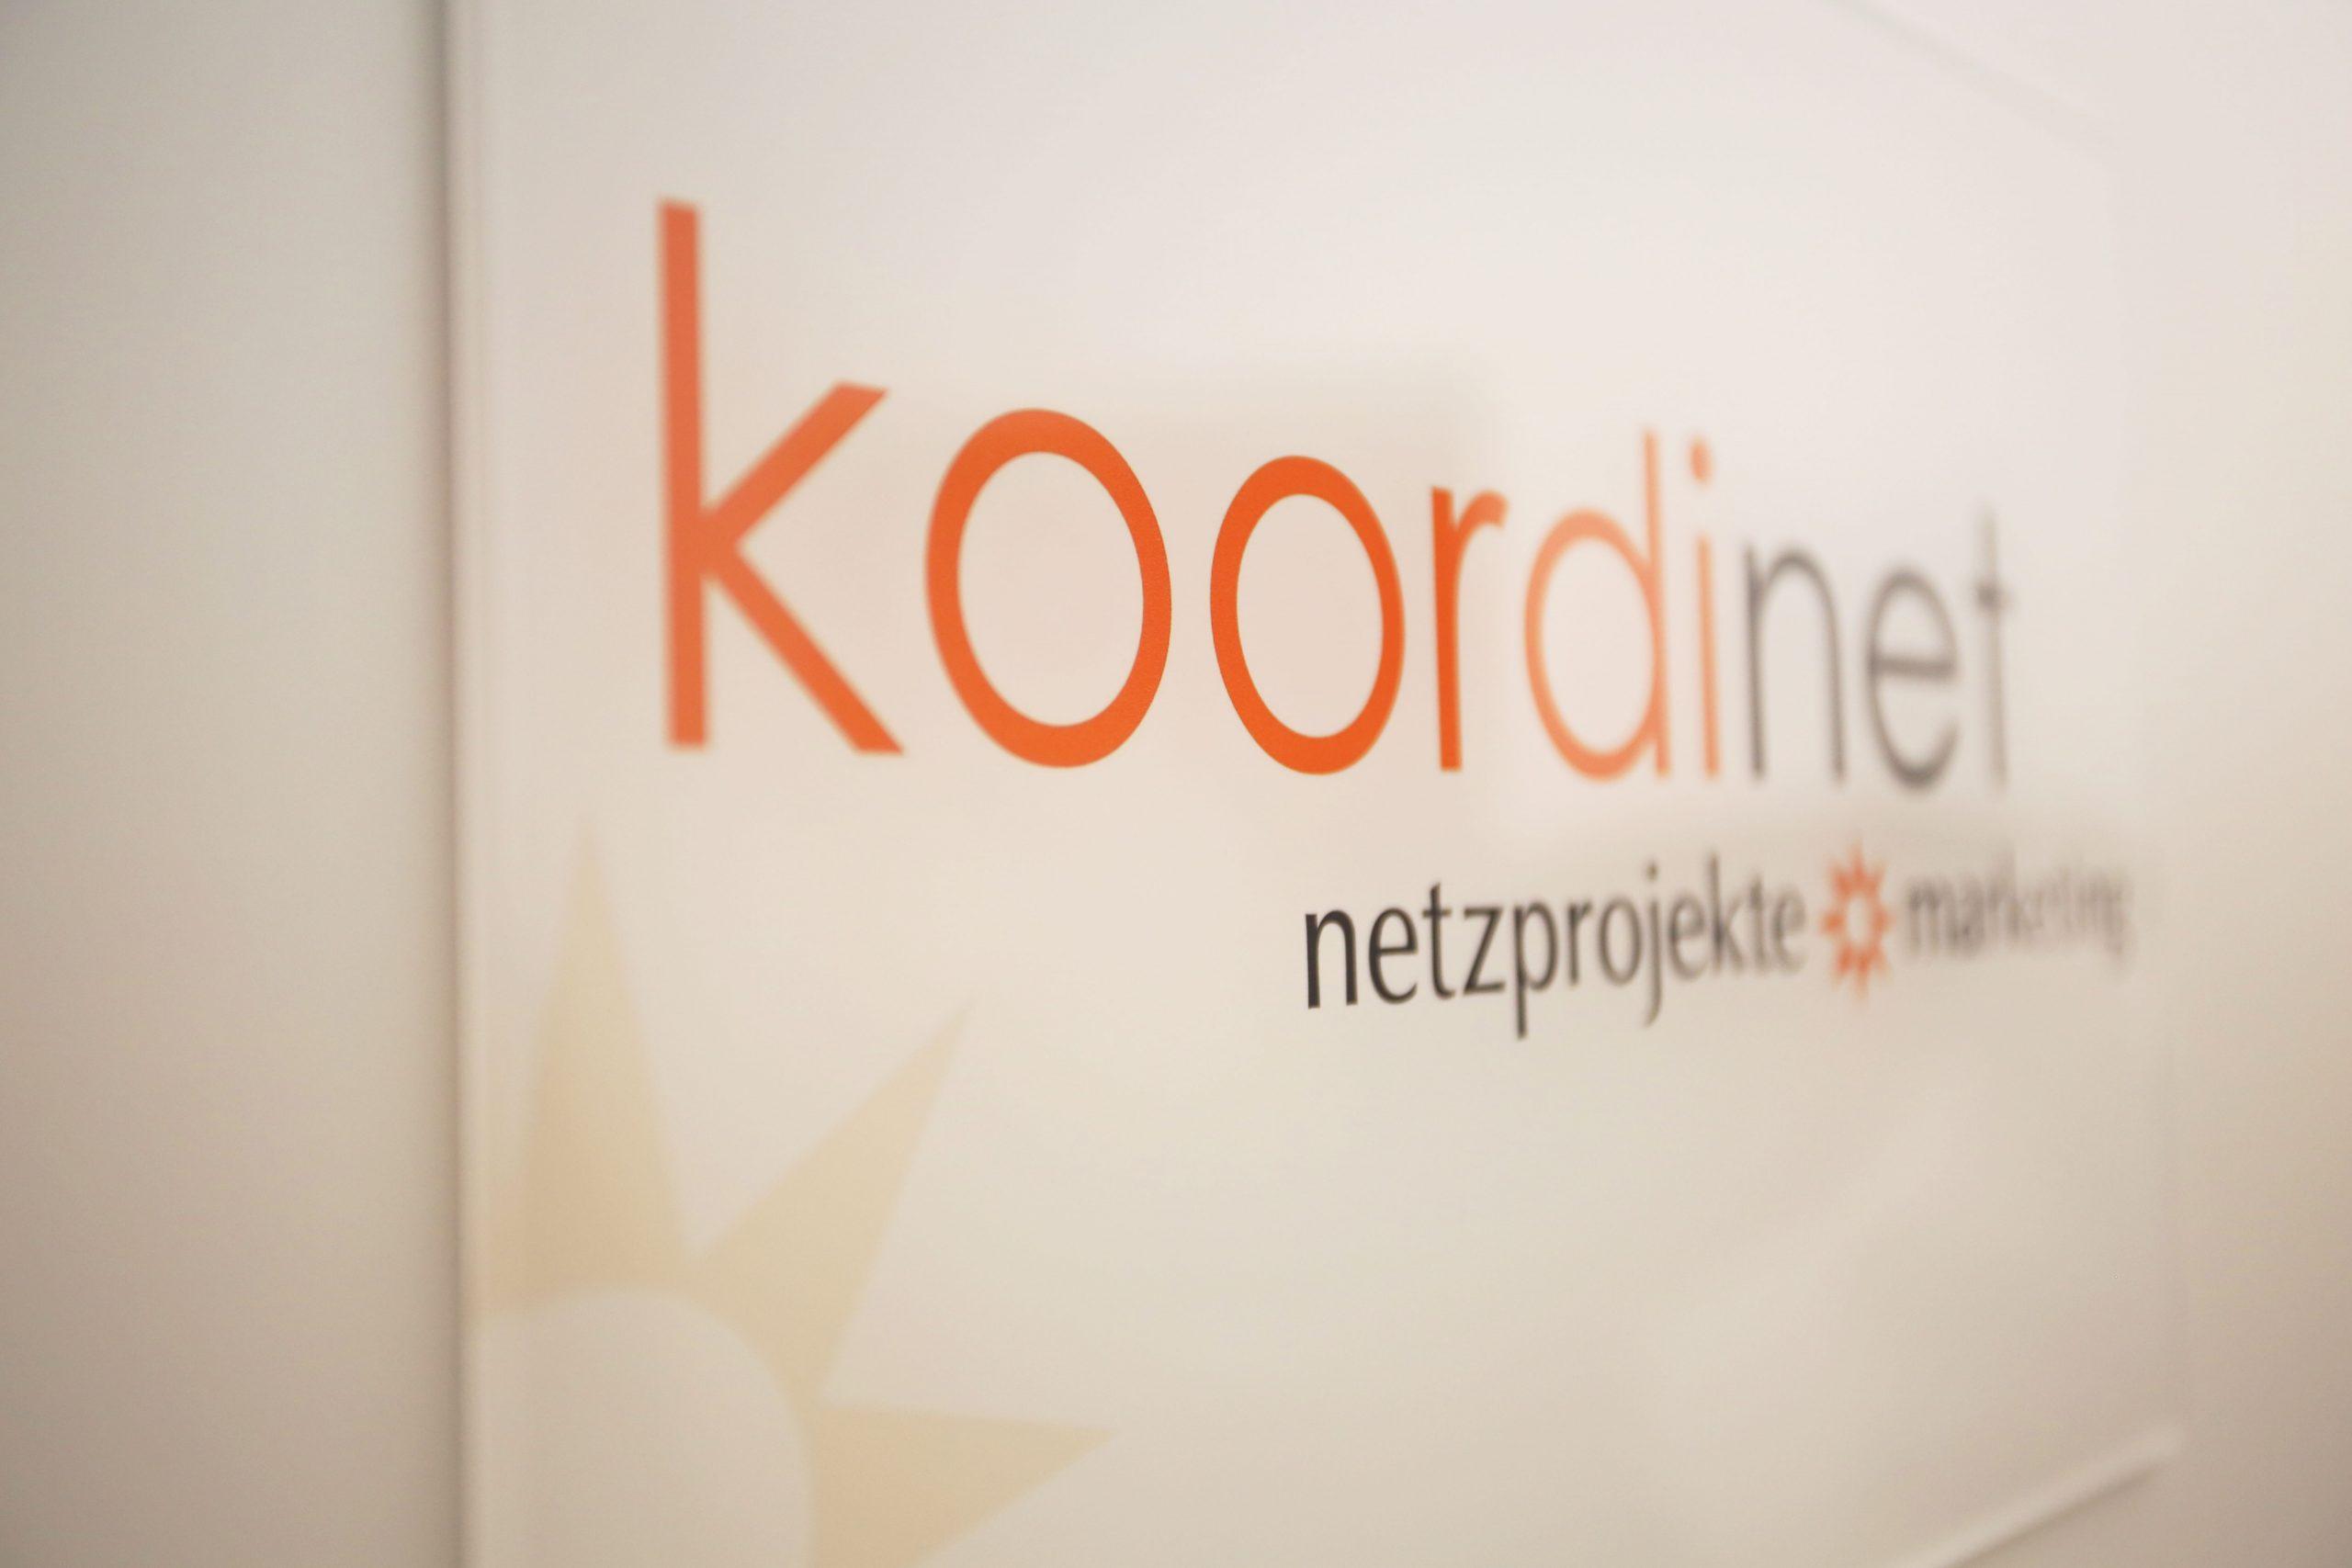 : Firmenlogo koordinet netzprojekte & marketing